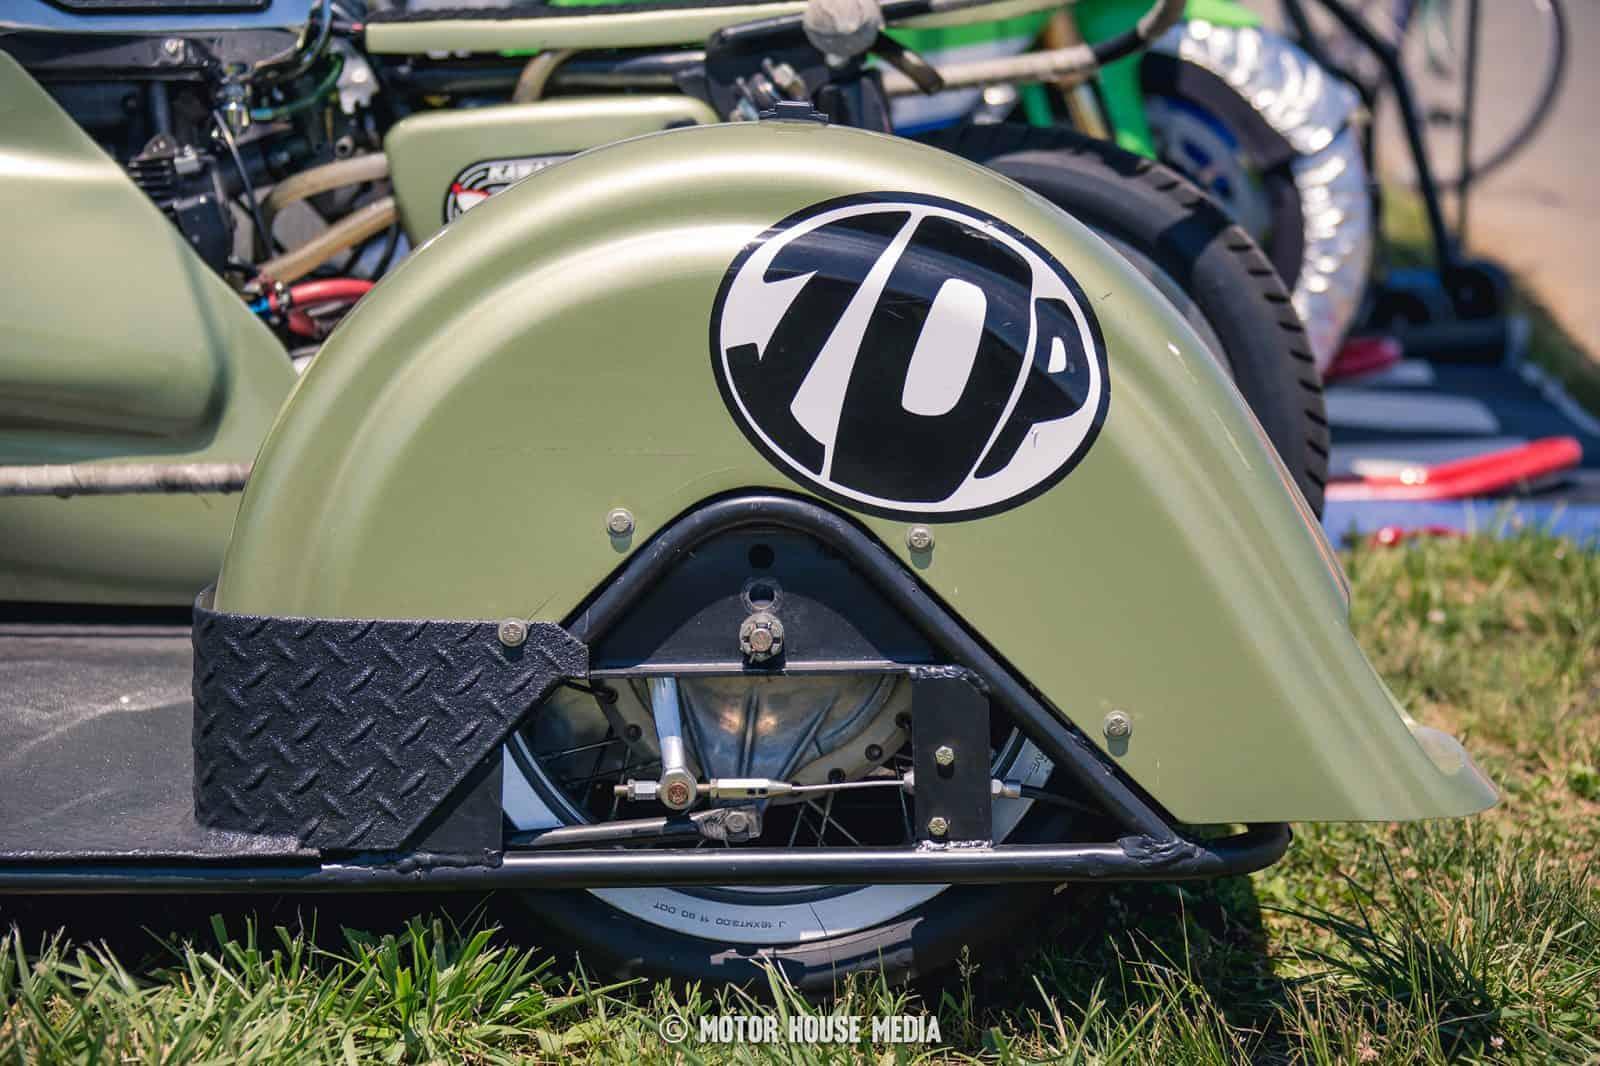 AHRMA vintage Sidecar bikes competing on track